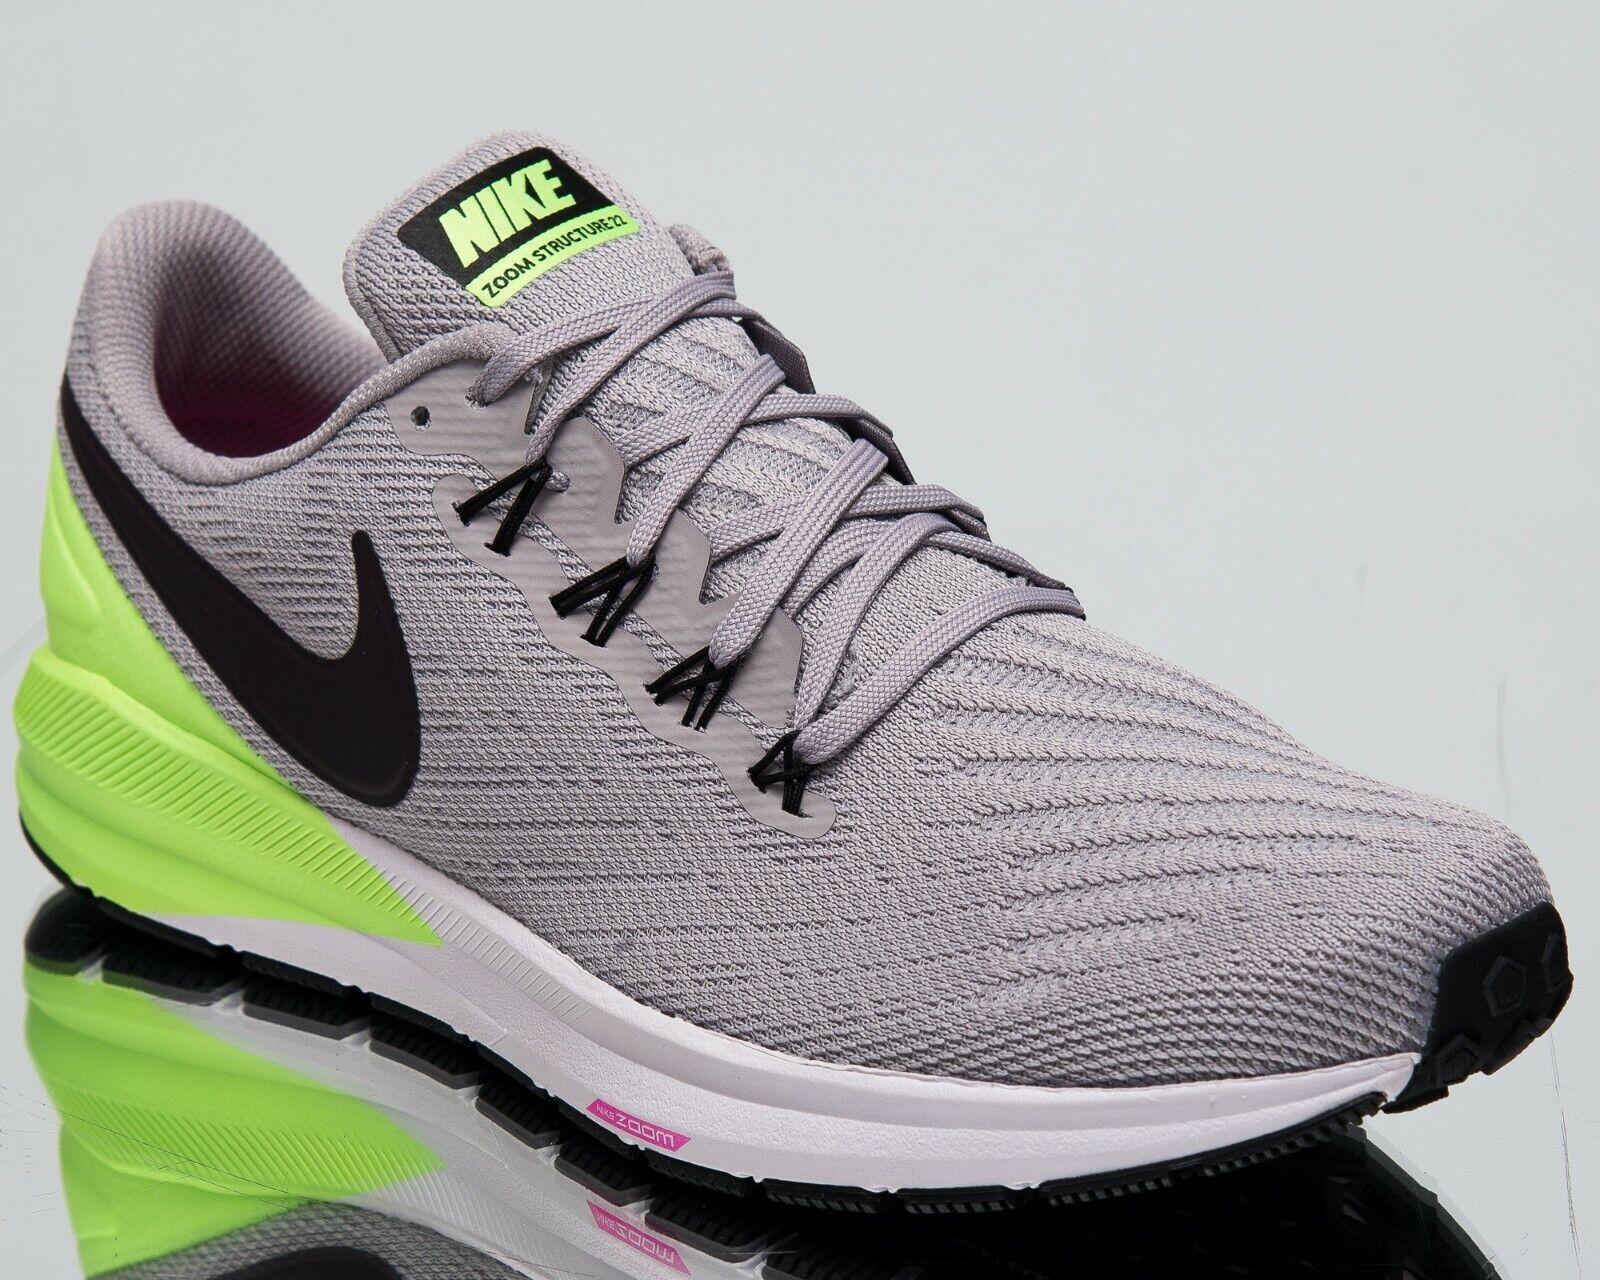 Nike Luft Zoom Struktur 22 Neue Herren Laufschuhe Atmosphere grau AA1636-004